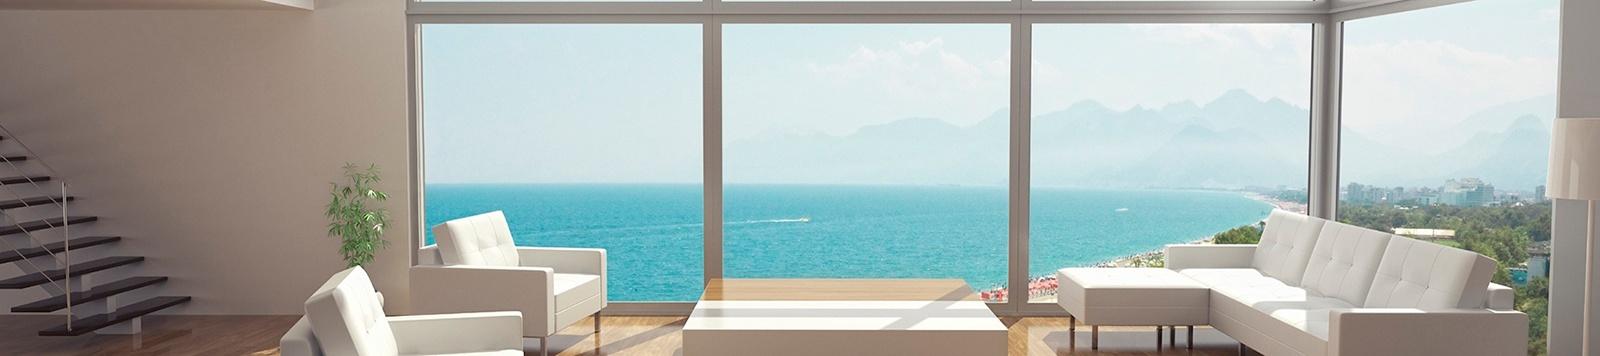 Residential-Window-Tinting-Orange-County.jpg